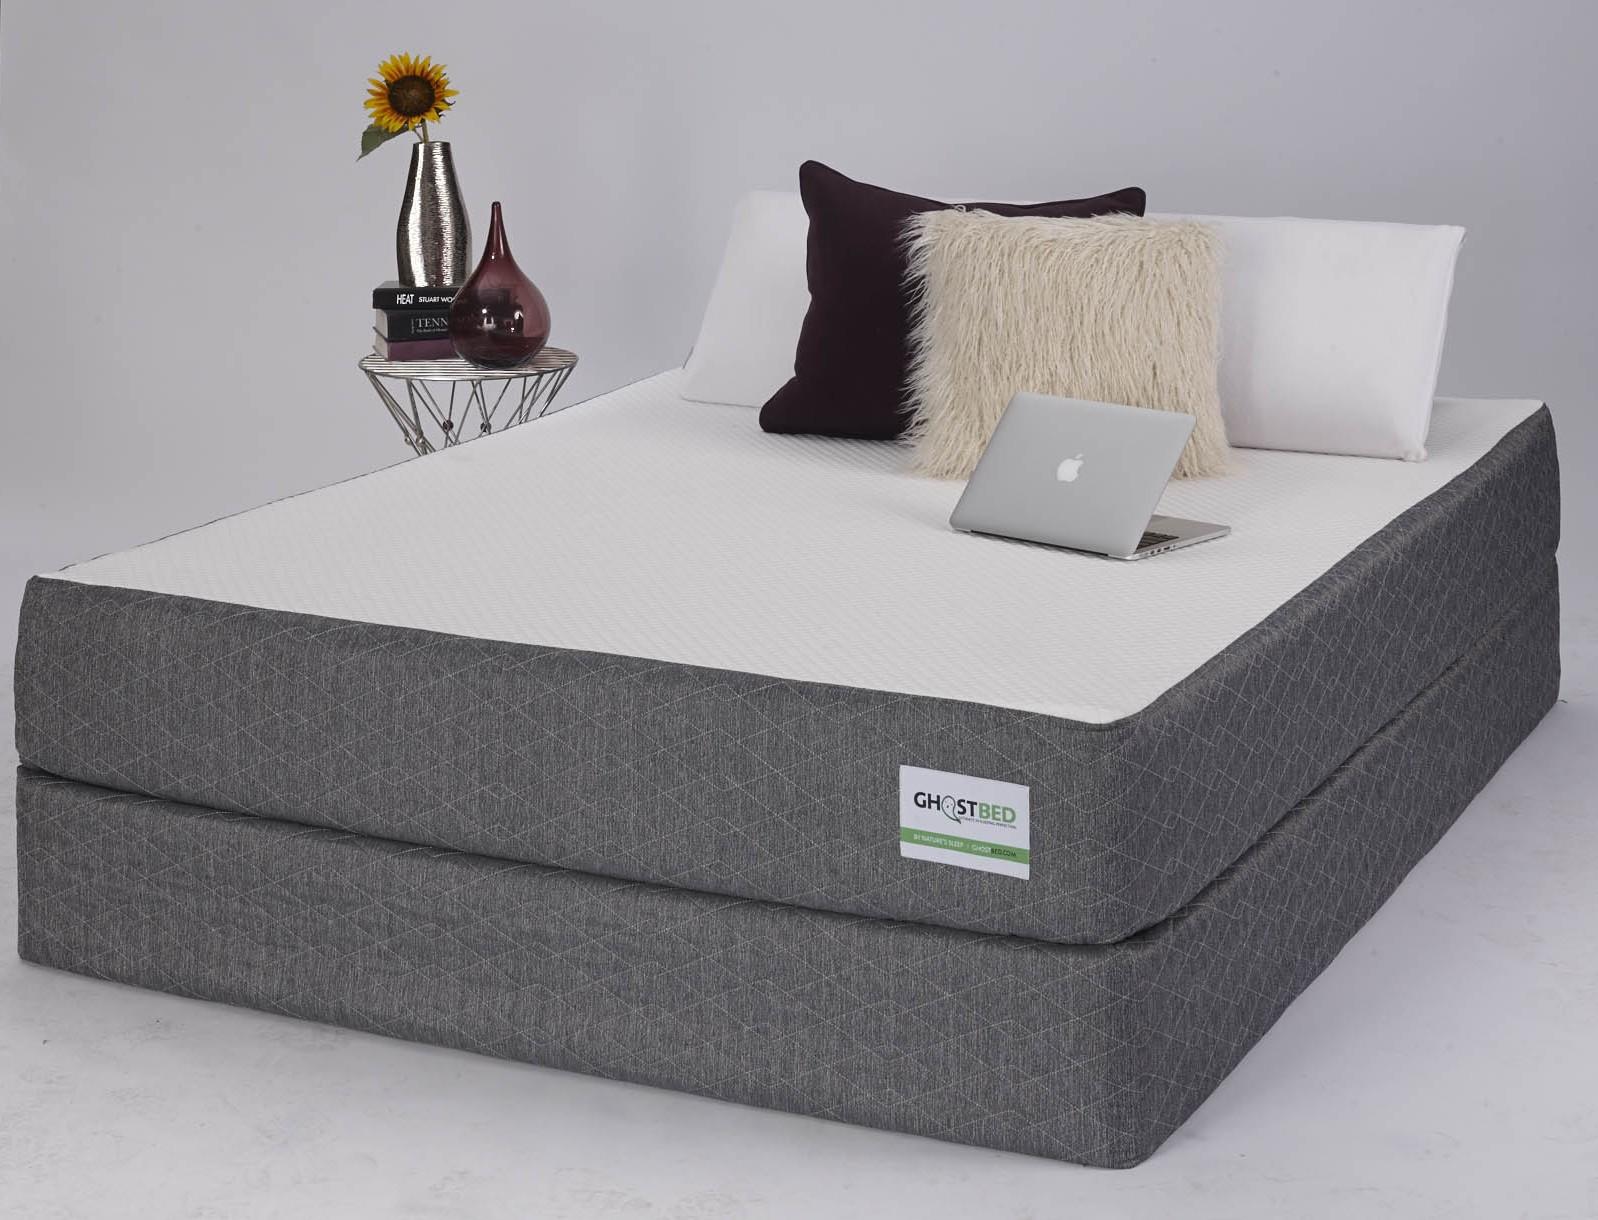 com reviews mattress goodbed saatva picture mattresses